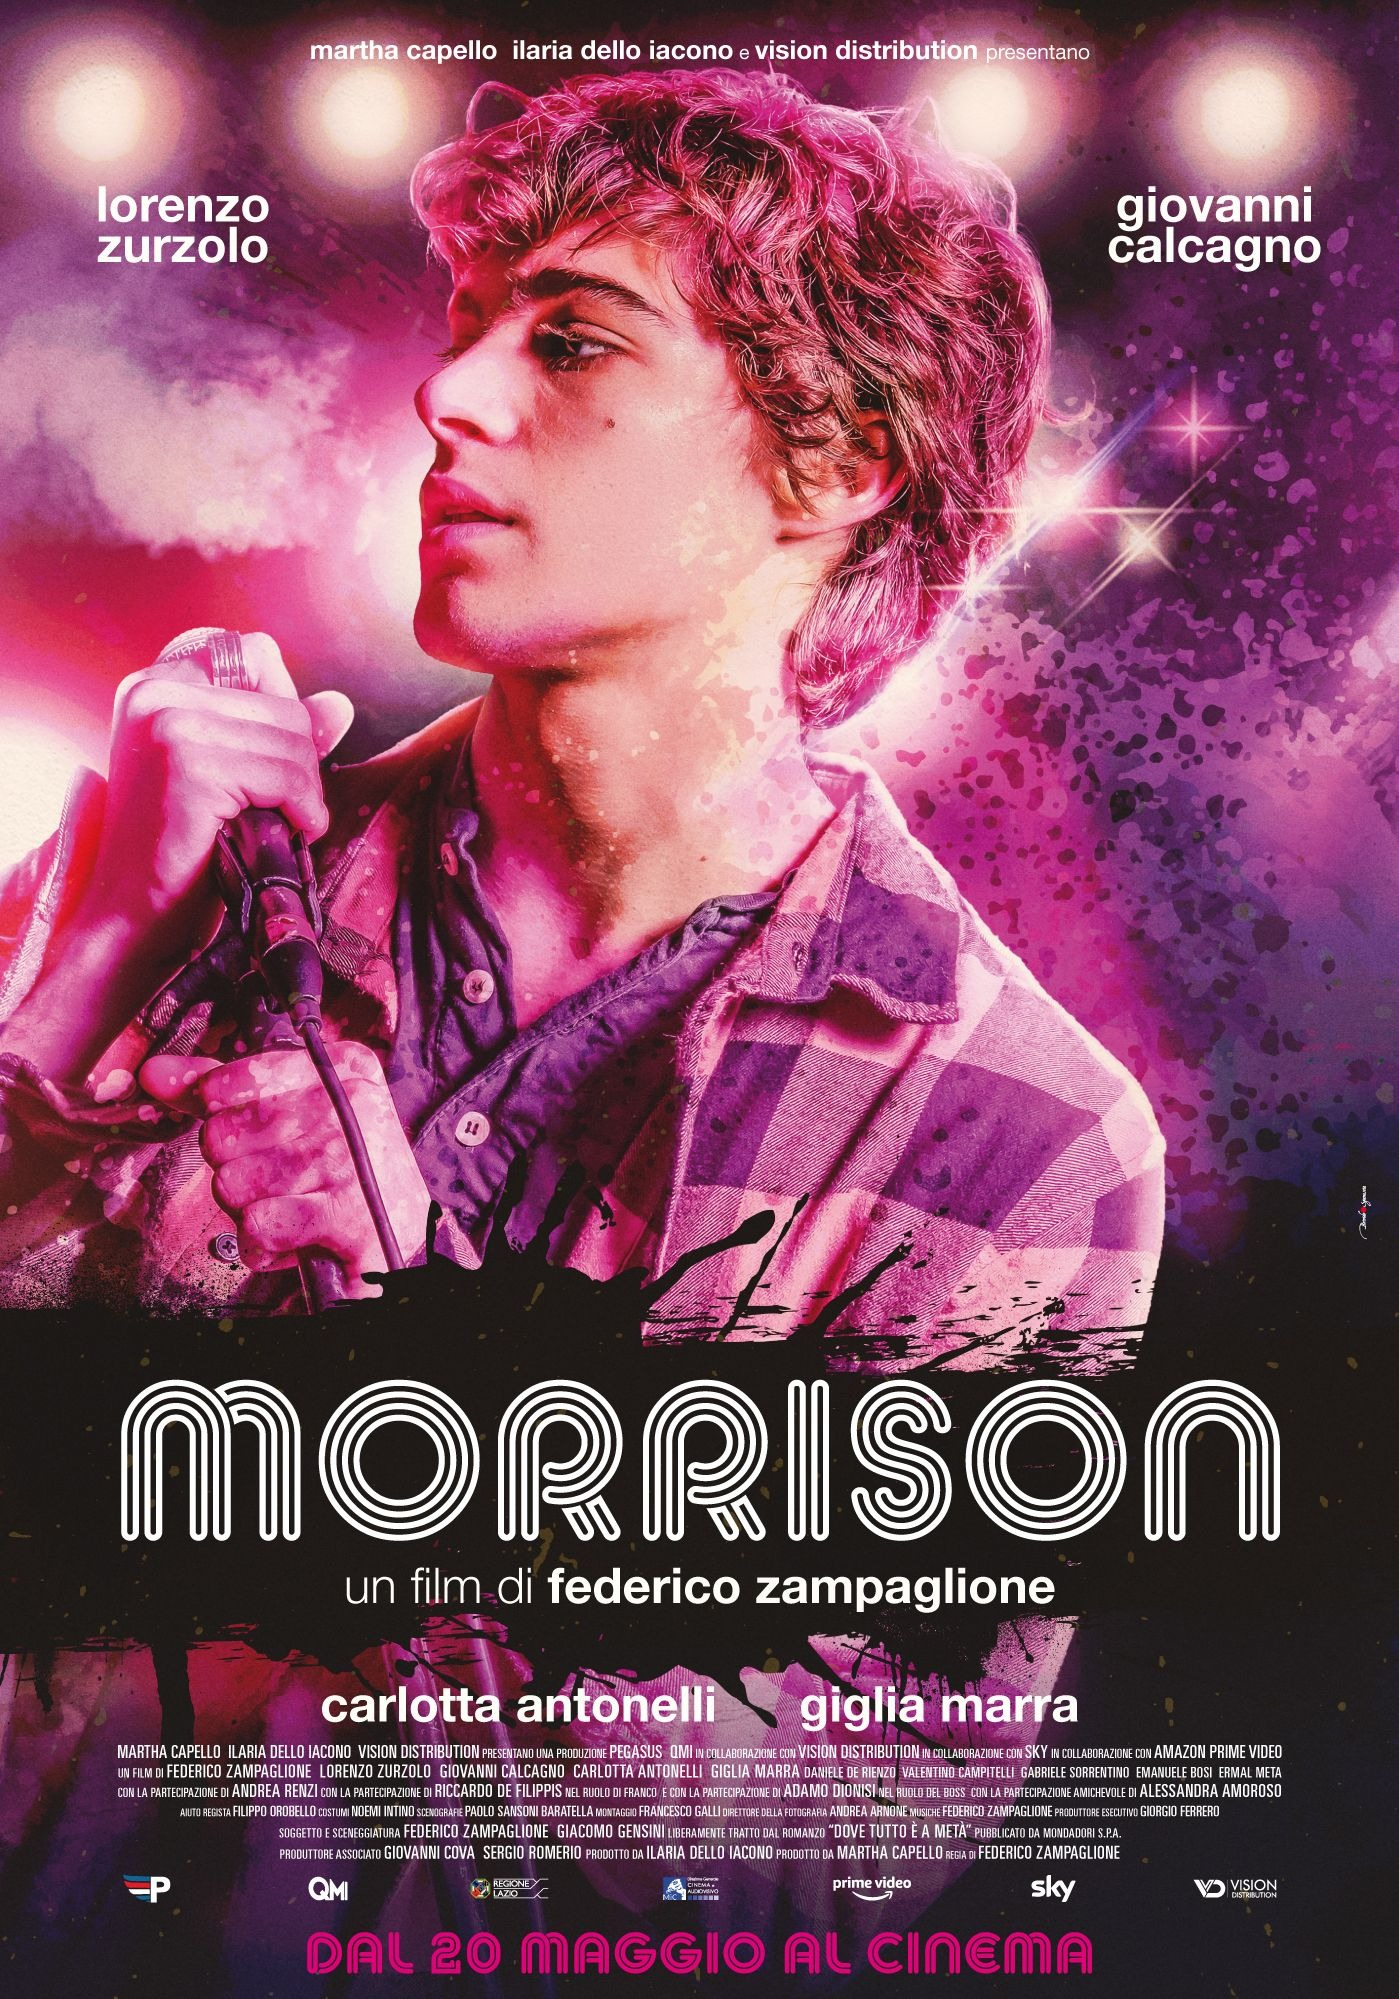 morrisonrecensione1-1621852861.jpg